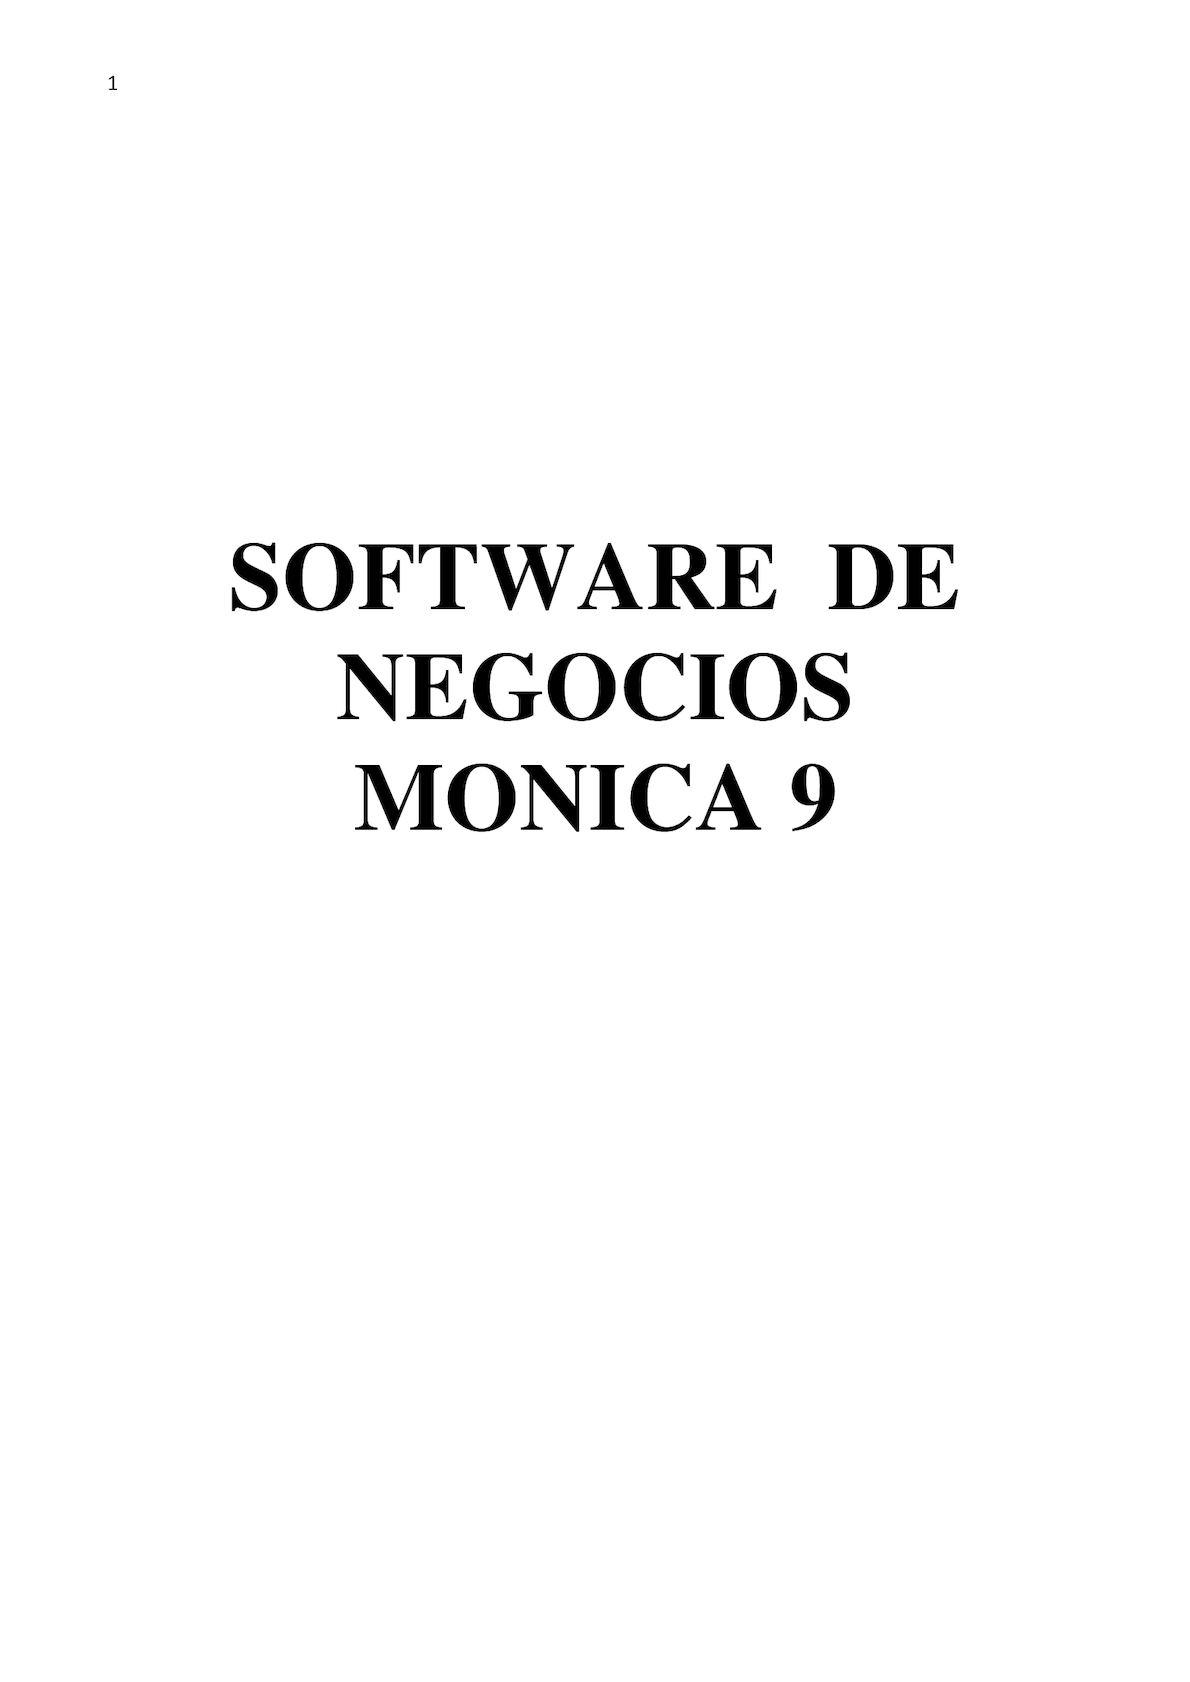 Manual Monica 9 0